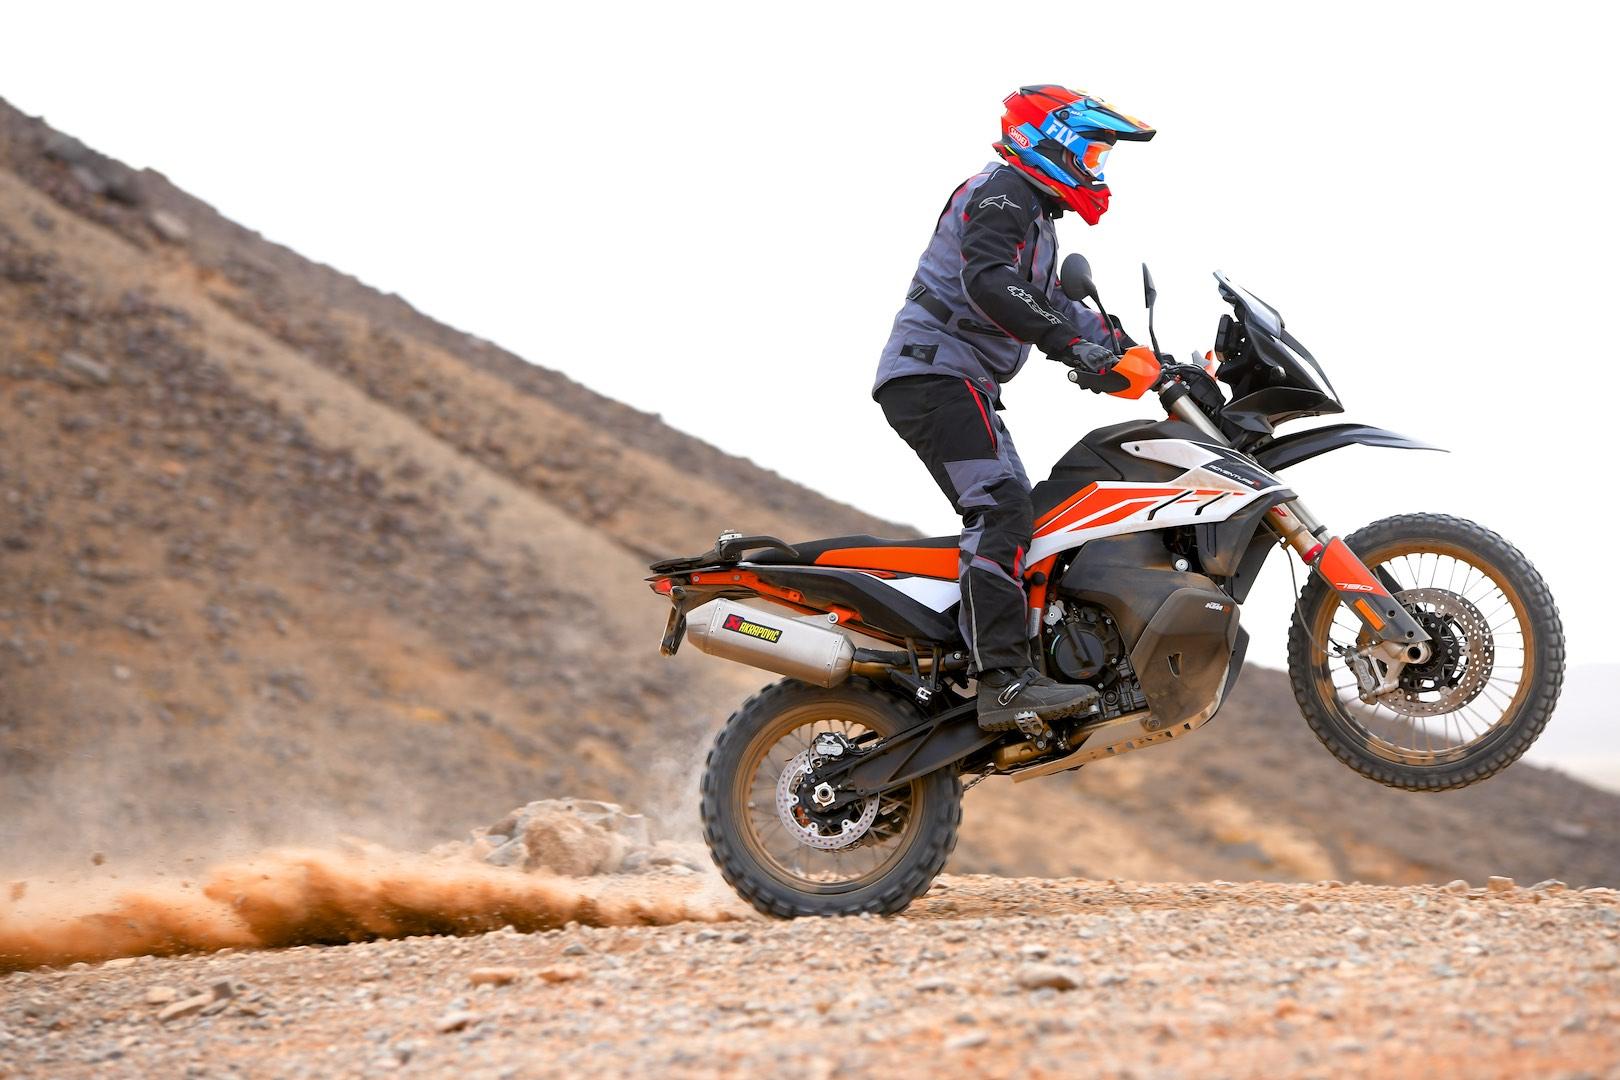 KTM 790 Adventure R ADV motorcycle